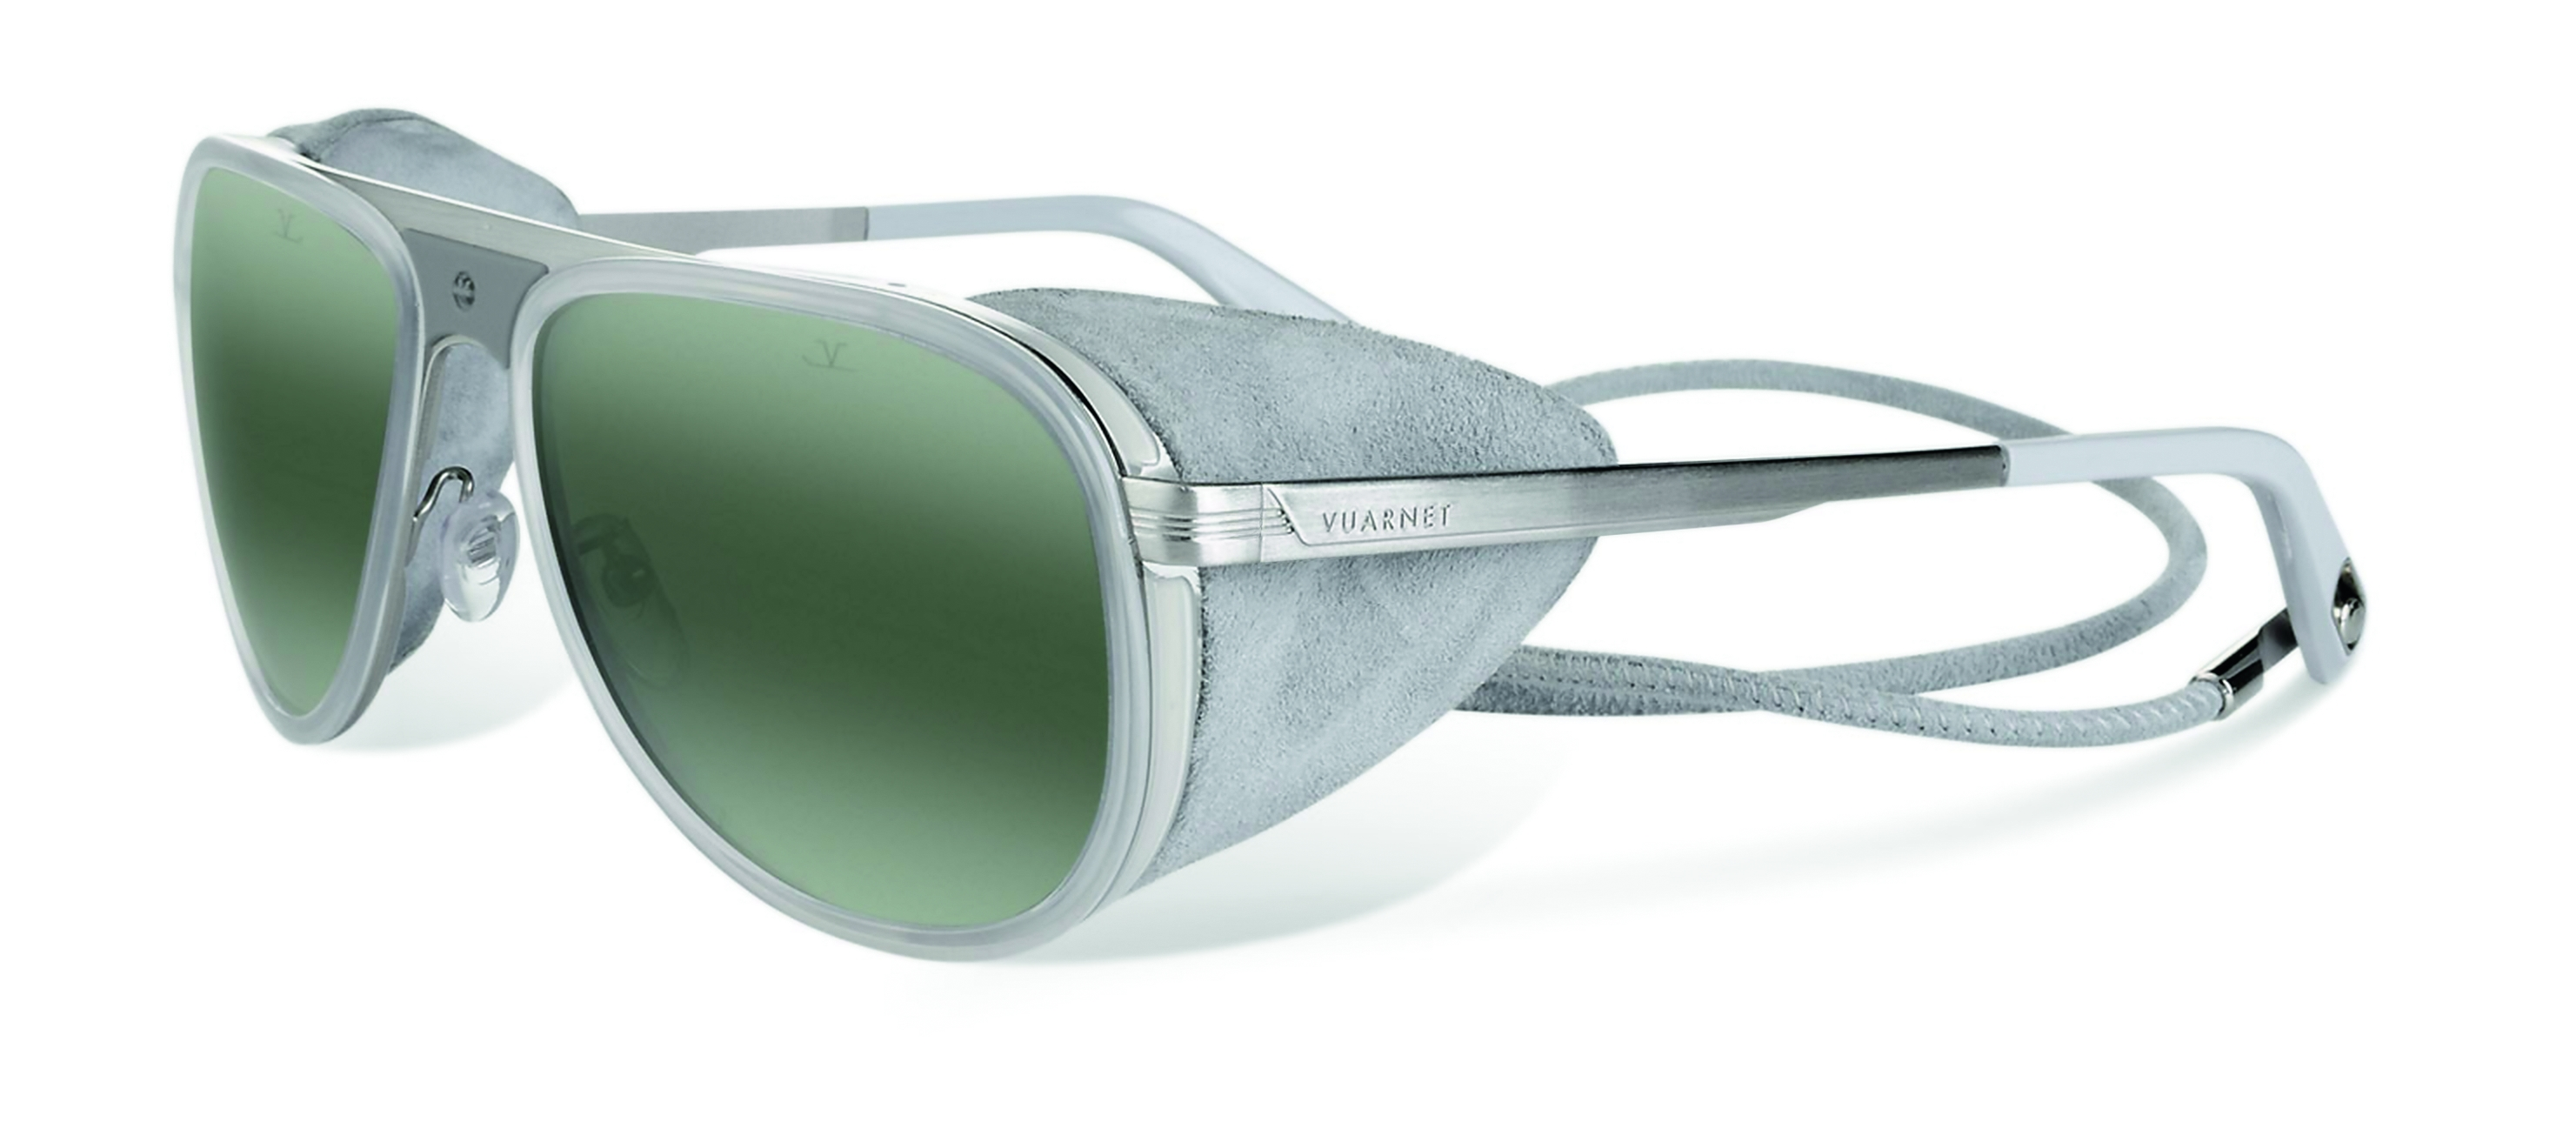 VUARNET Glacier - Grey with SX3000 lens